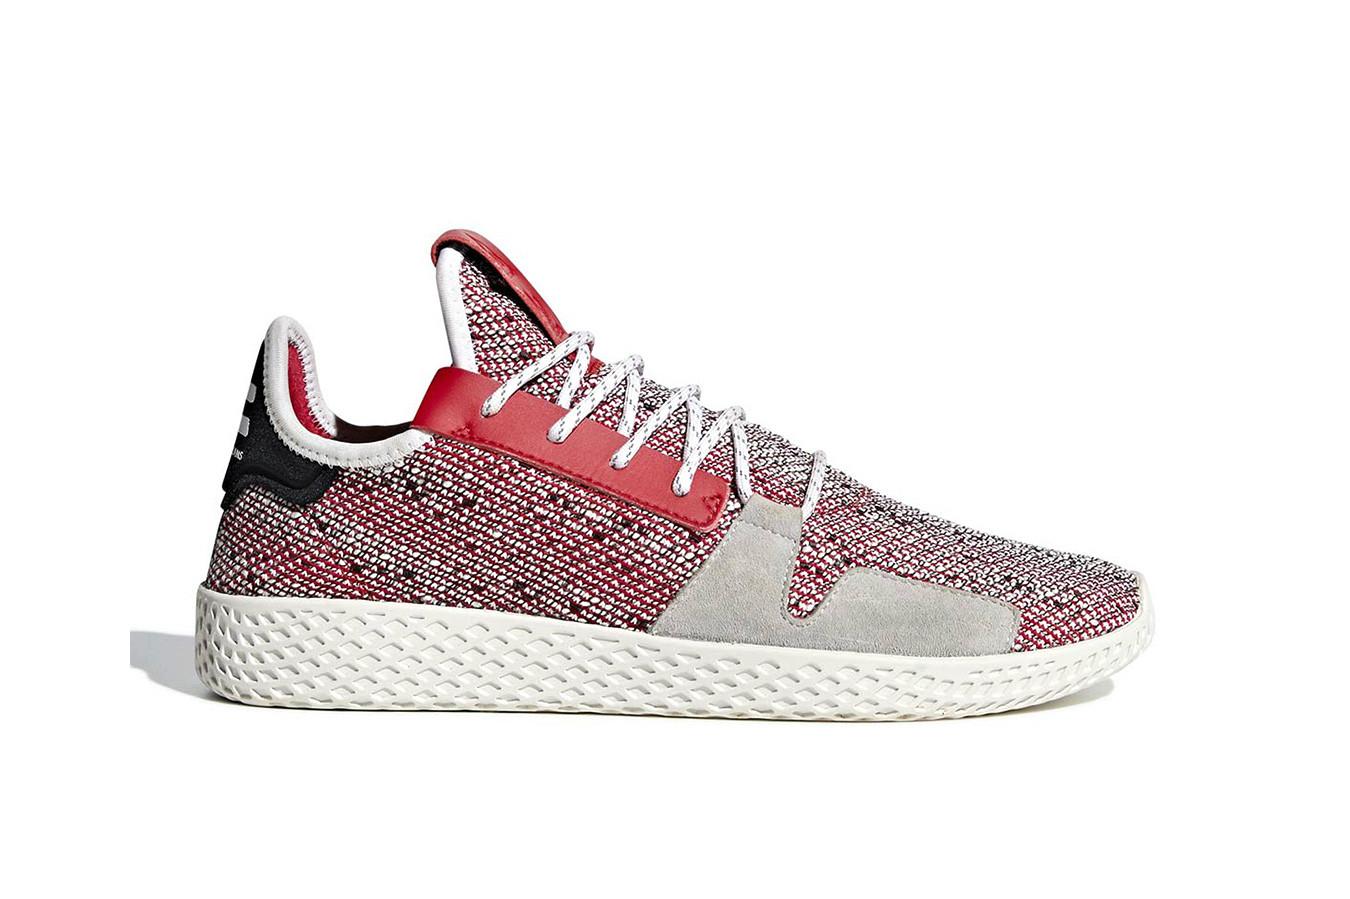 pharrell-adidas-tennis-hu-v2-first-look-2